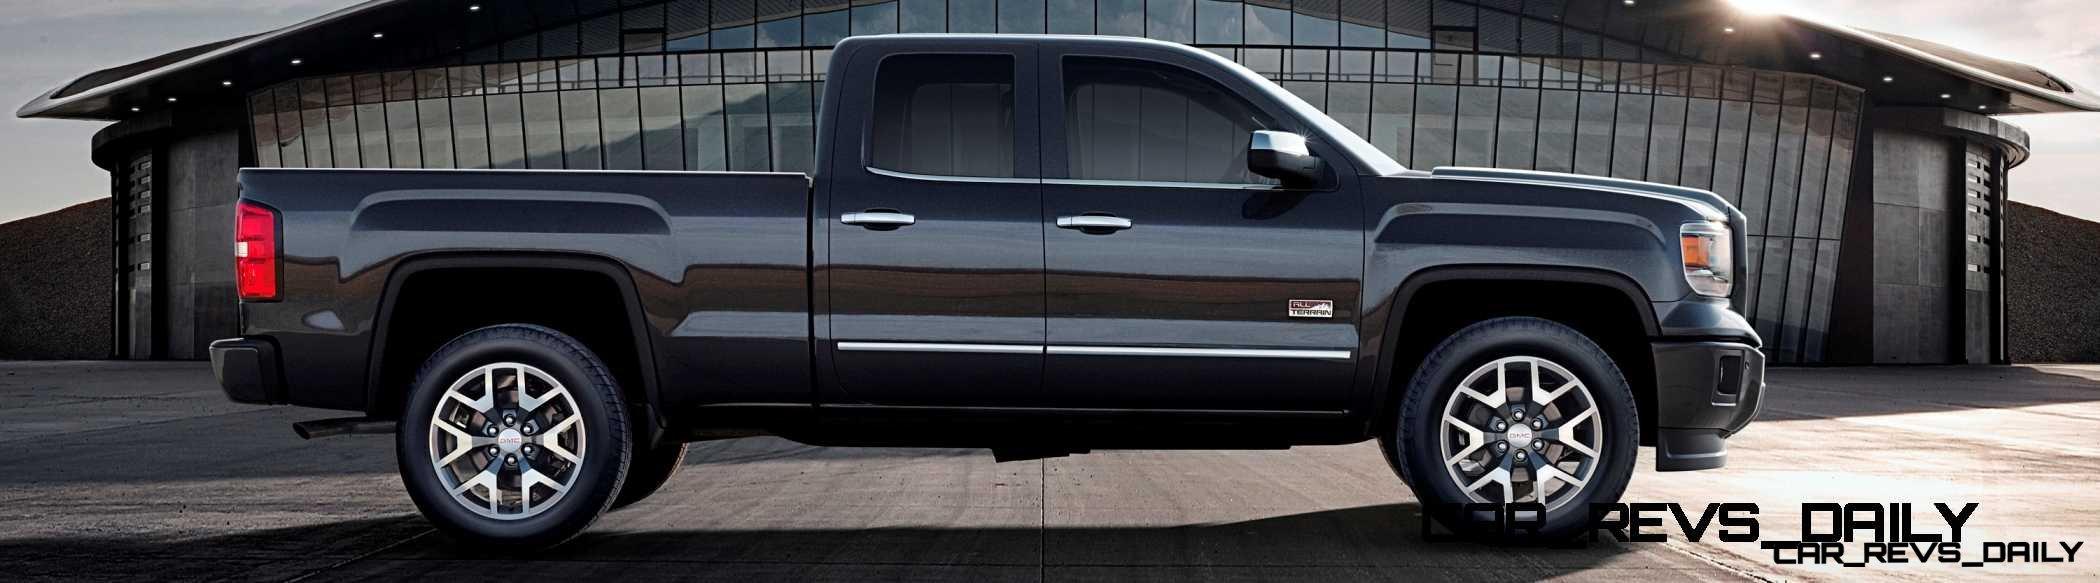 2014 gmc sierra all terrain double cab side profile in iridium metallic on location. Black Bedroom Furniture Sets. Home Design Ideas